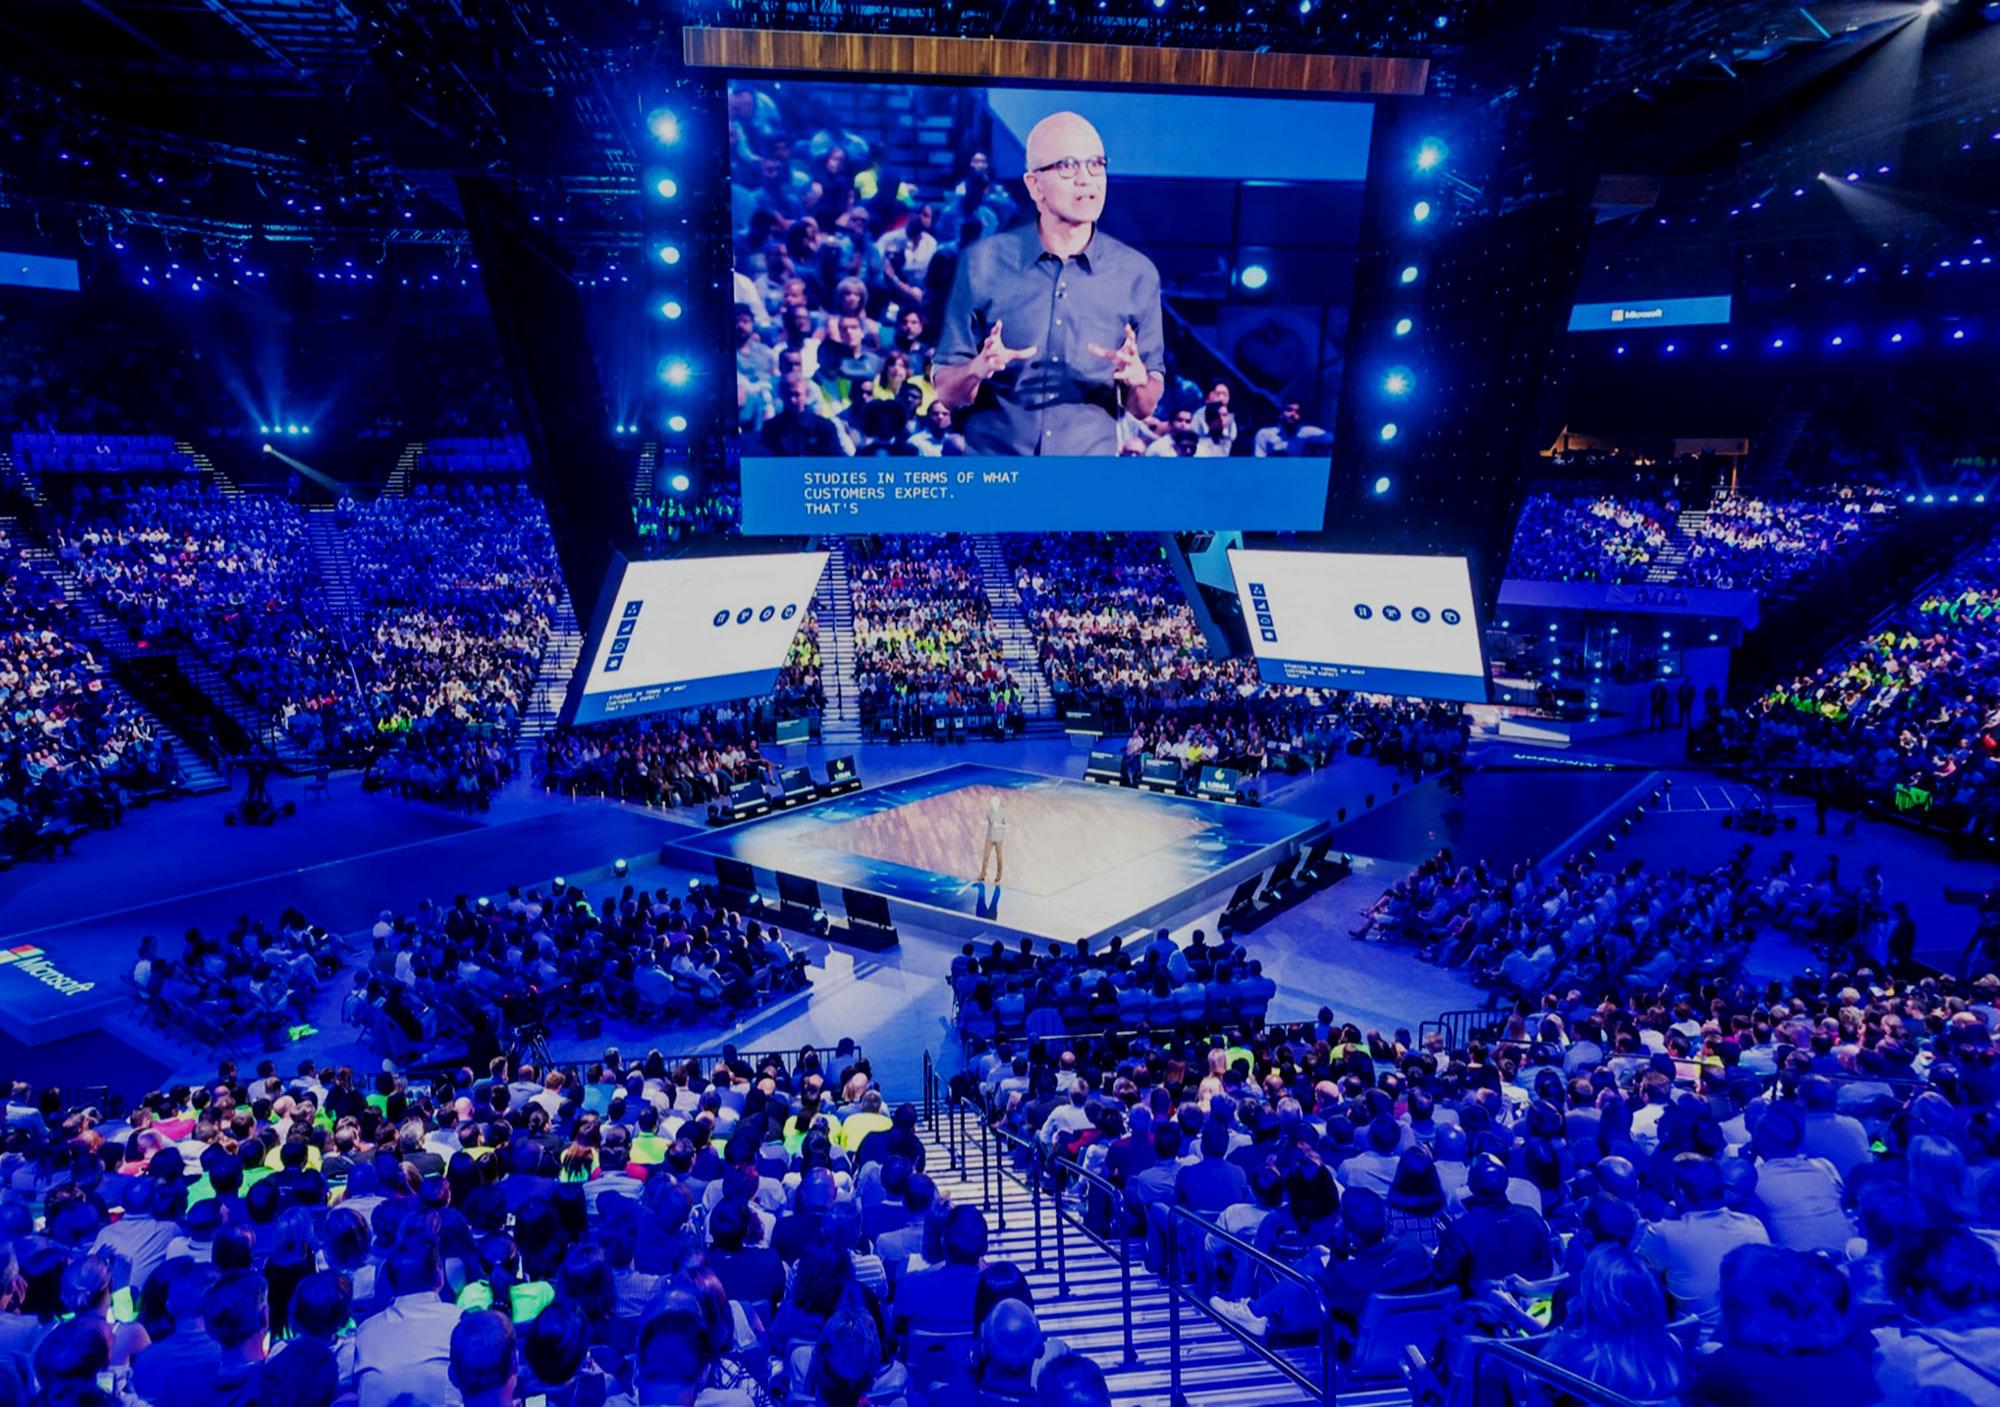 Microsoft: Ready + Inspire